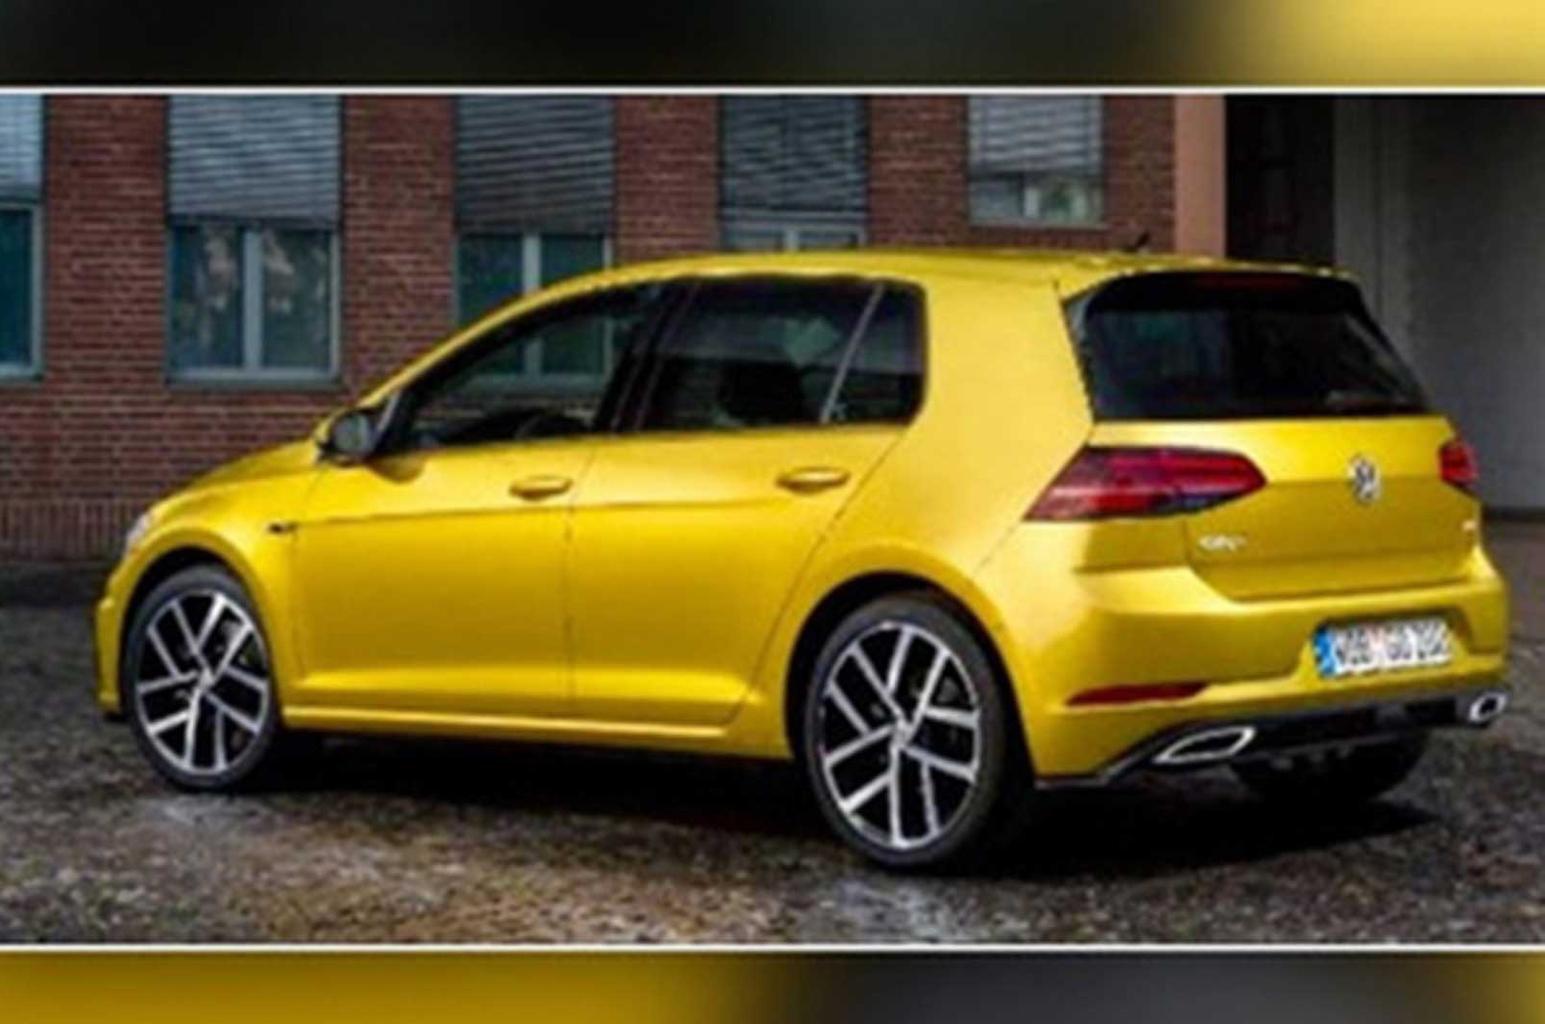 2017 Volkswagen Golf leaked ahead of official debut